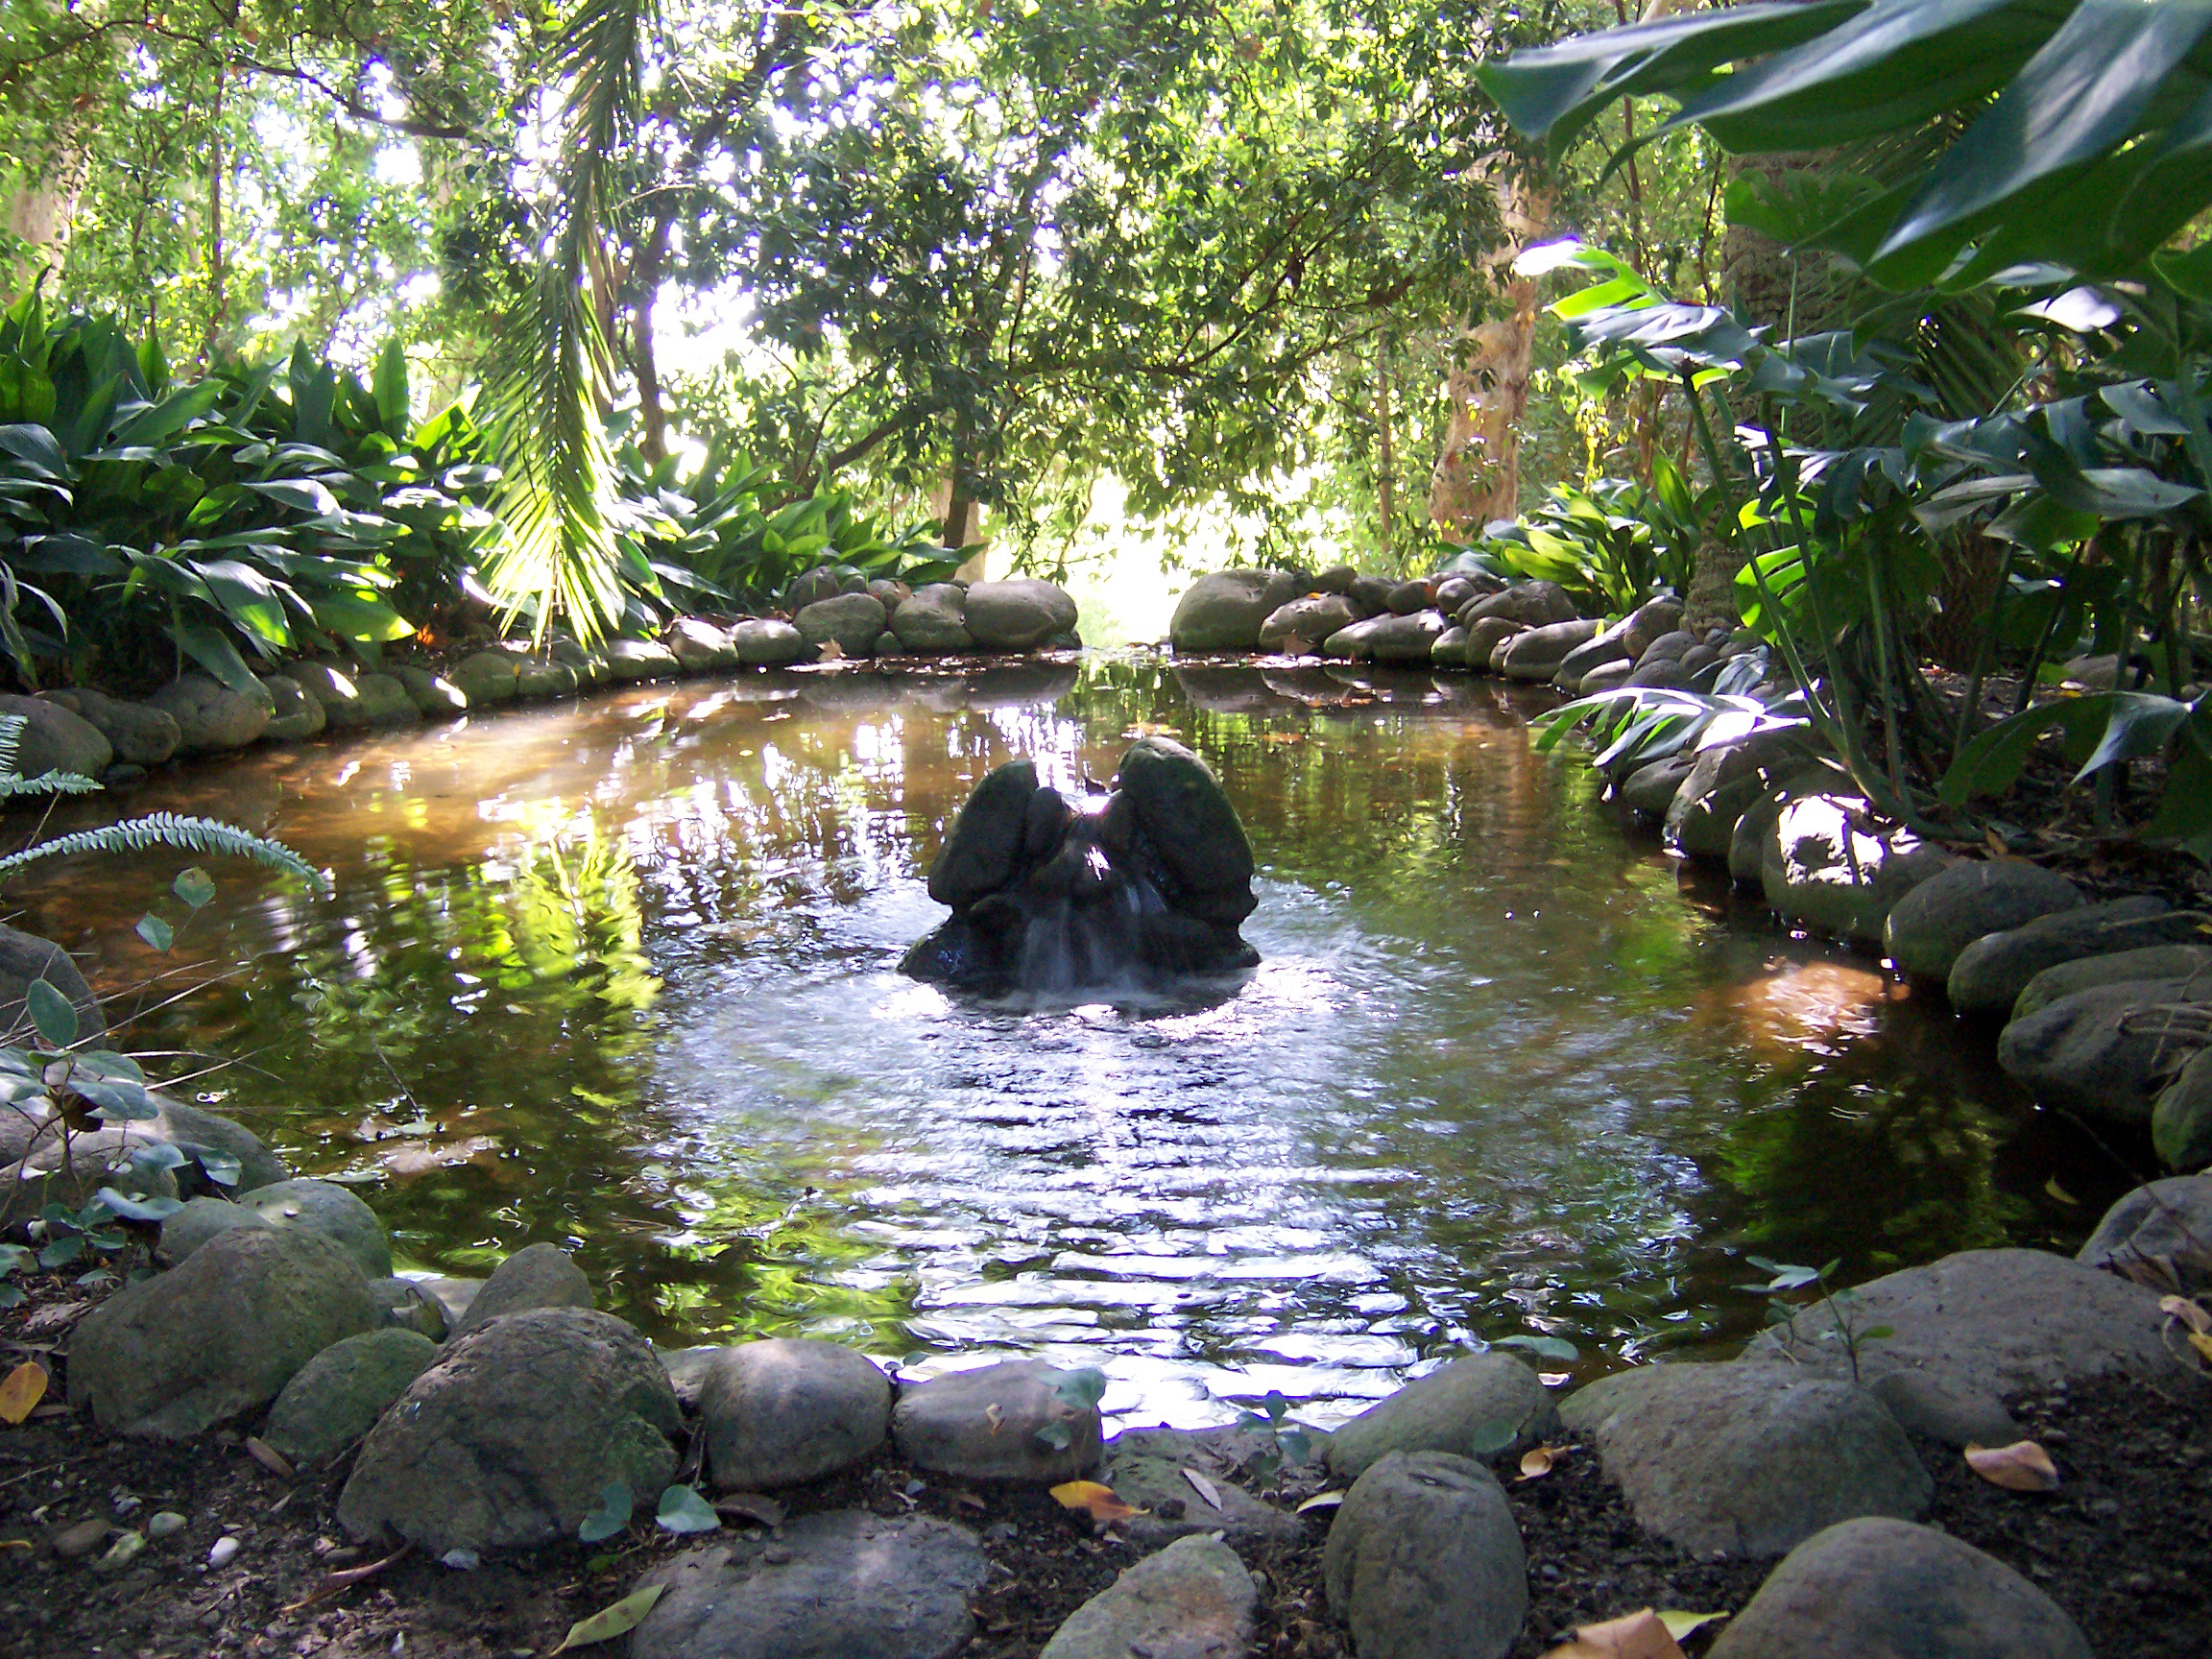 Jard n bot nico hist rico la concepci n fotos de m laga for Jardin botanico de malaga